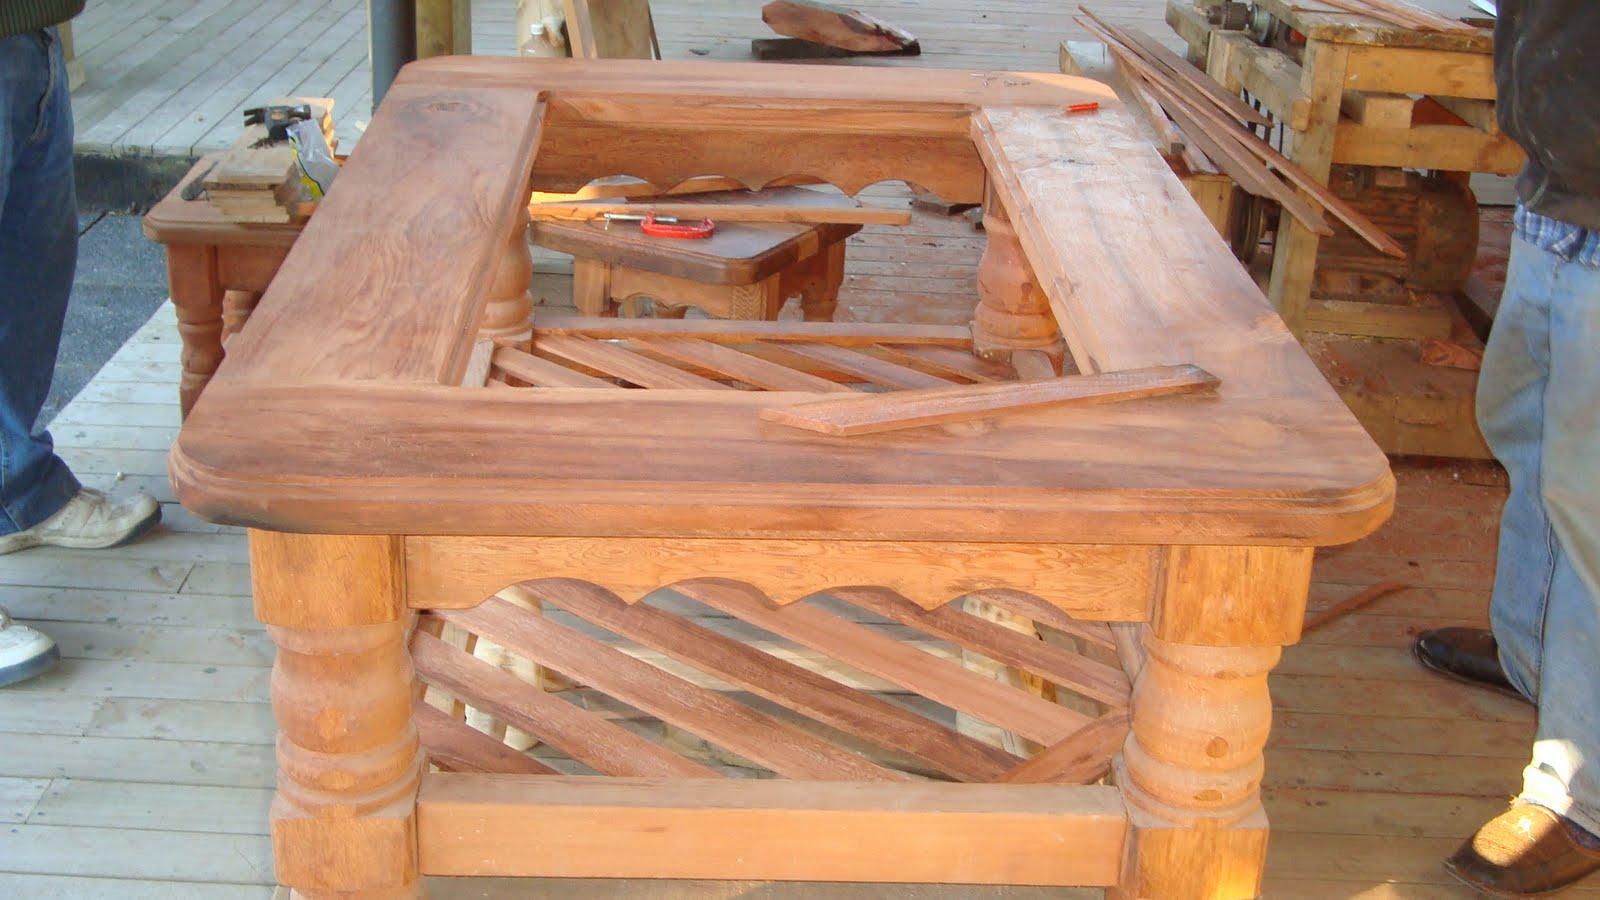 Muebles Levin Puerto Montt - Artesanos De Alerce Historico[mjhdah]http://2.bp.blogspot.com/_imots7BOjeM/TE5HFM4BW4I/AAAAAAAAHOQ/msFj6zhqrOc/s1600/Artesania+en+madera+nativa.JPG